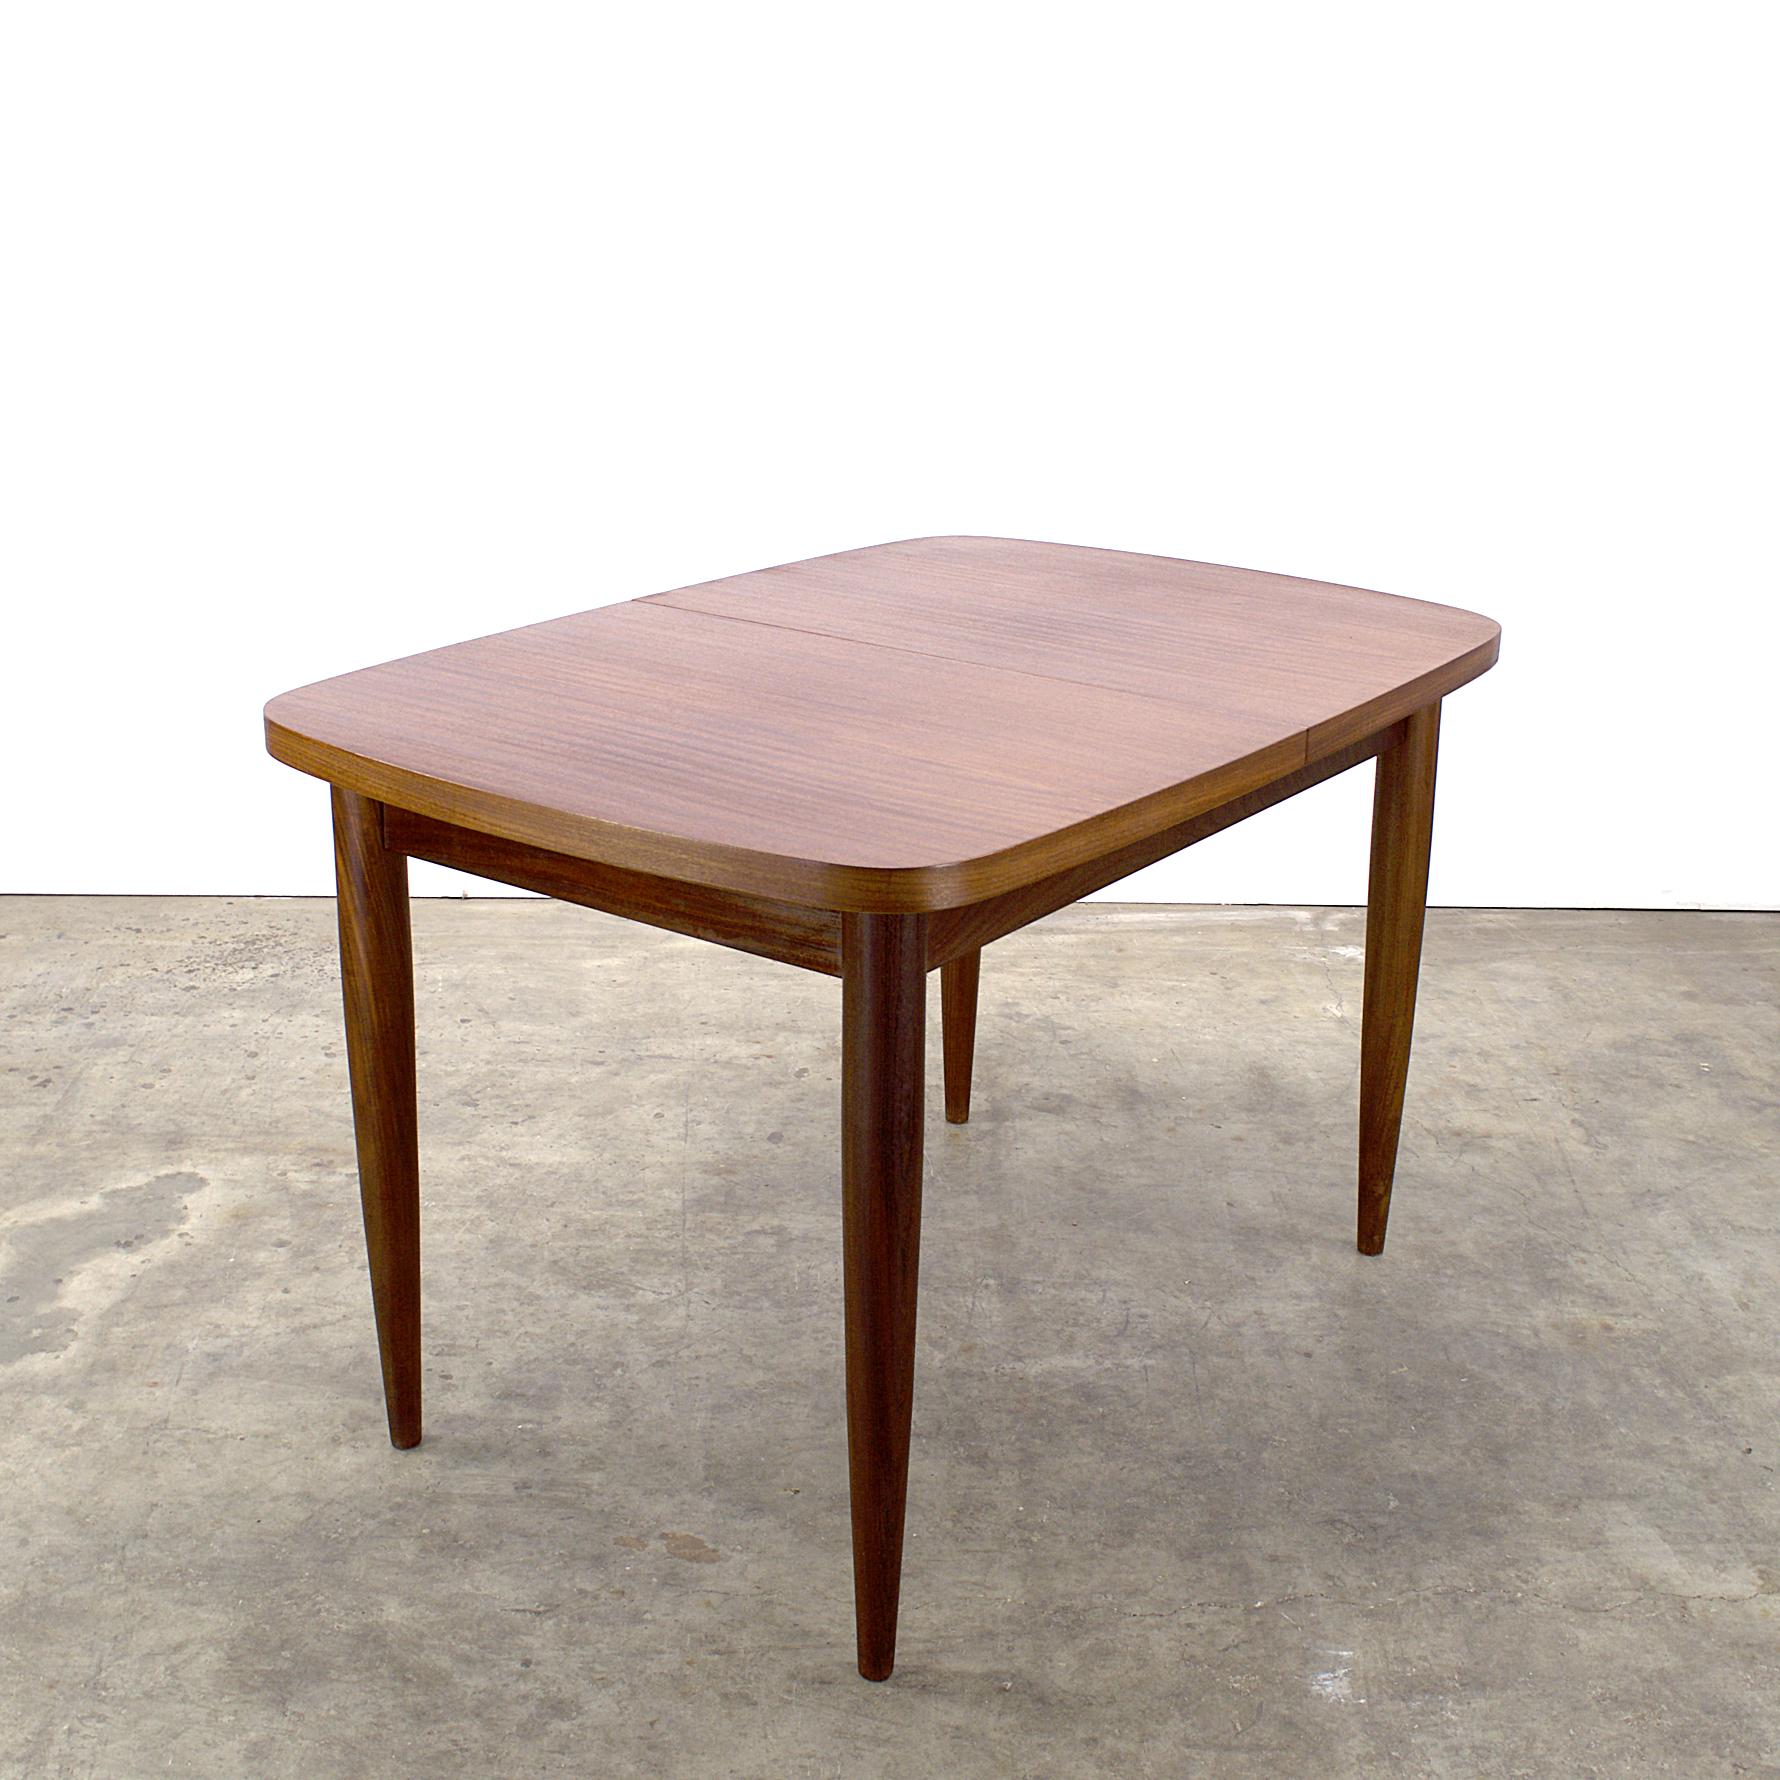 Teak Extendable Coffee Table: 60's Teak Farstrup Extendable Dining Table